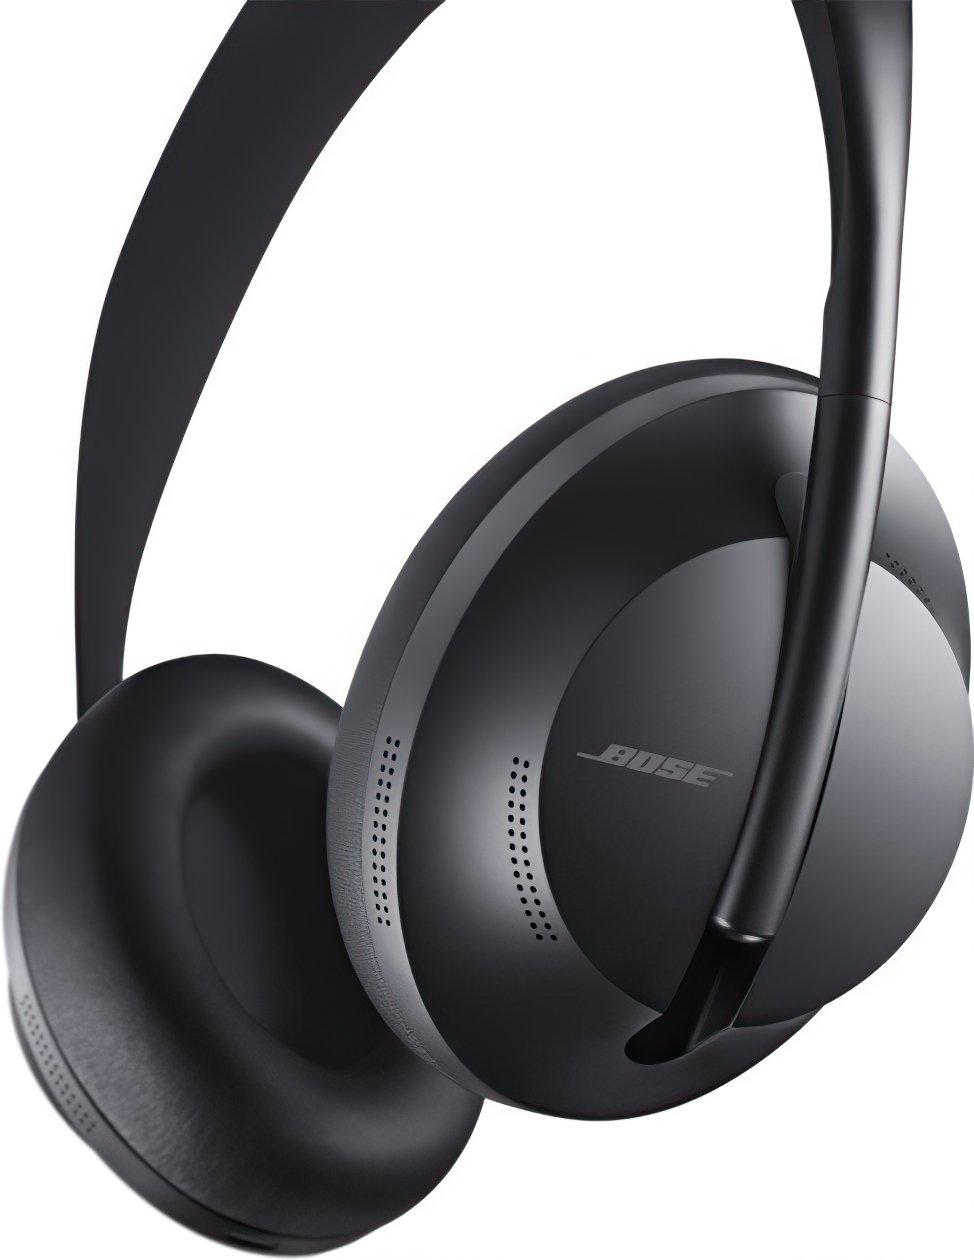 Навушники Bose Noise Cancelling Headphones 700 Black фото3